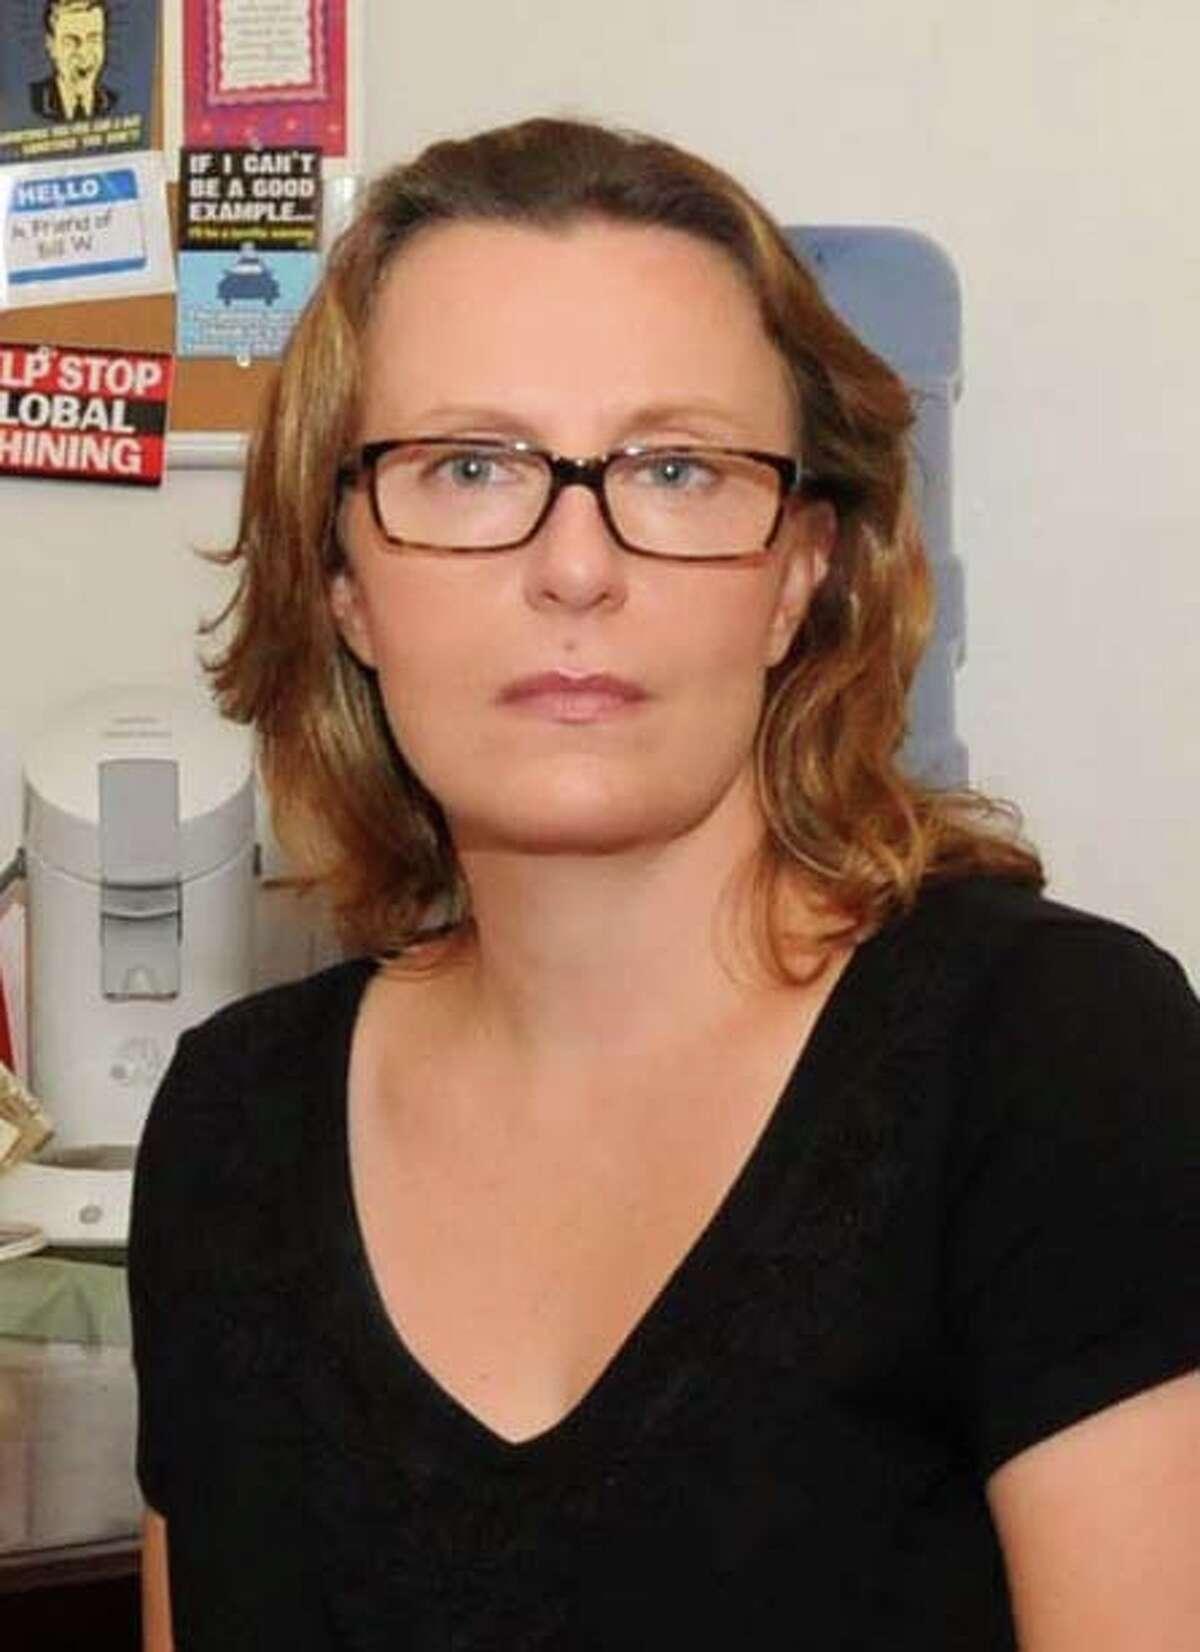 Liz Jorgensen is a Ridgefield therapist.